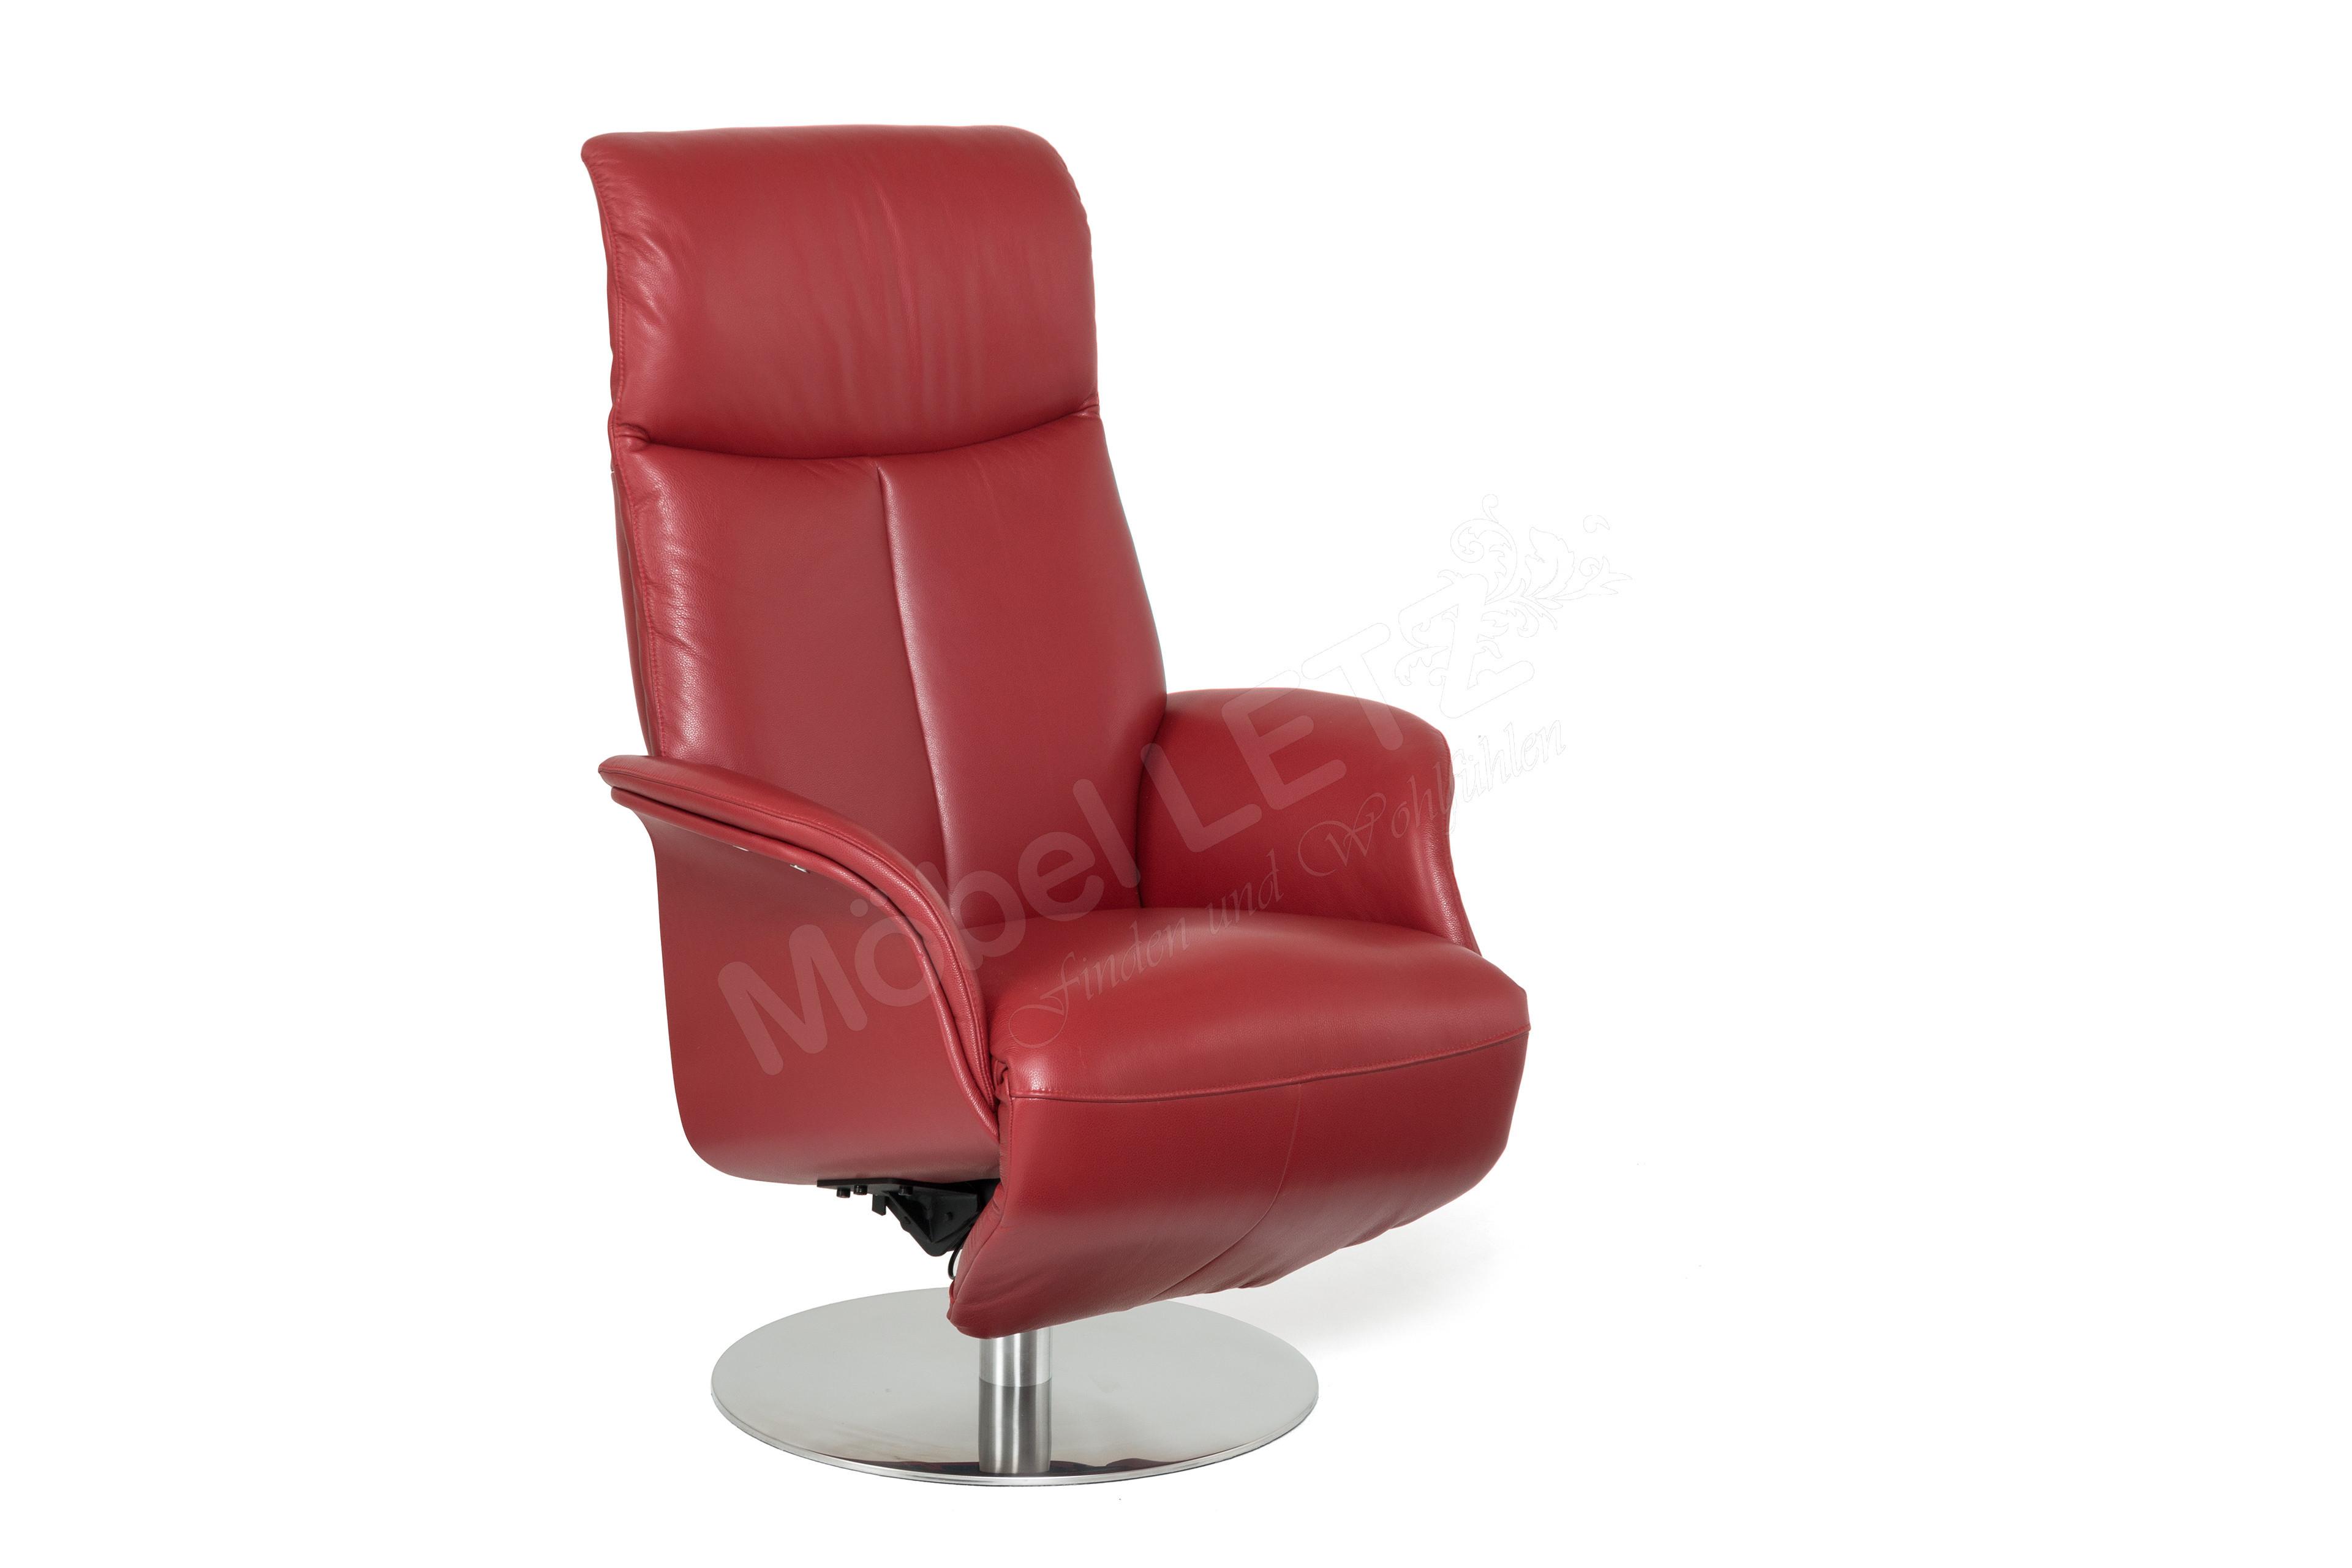 Hjort Knudsen 5013 Tv Sessel In Rot Mobel Letz Ihr Online Shop